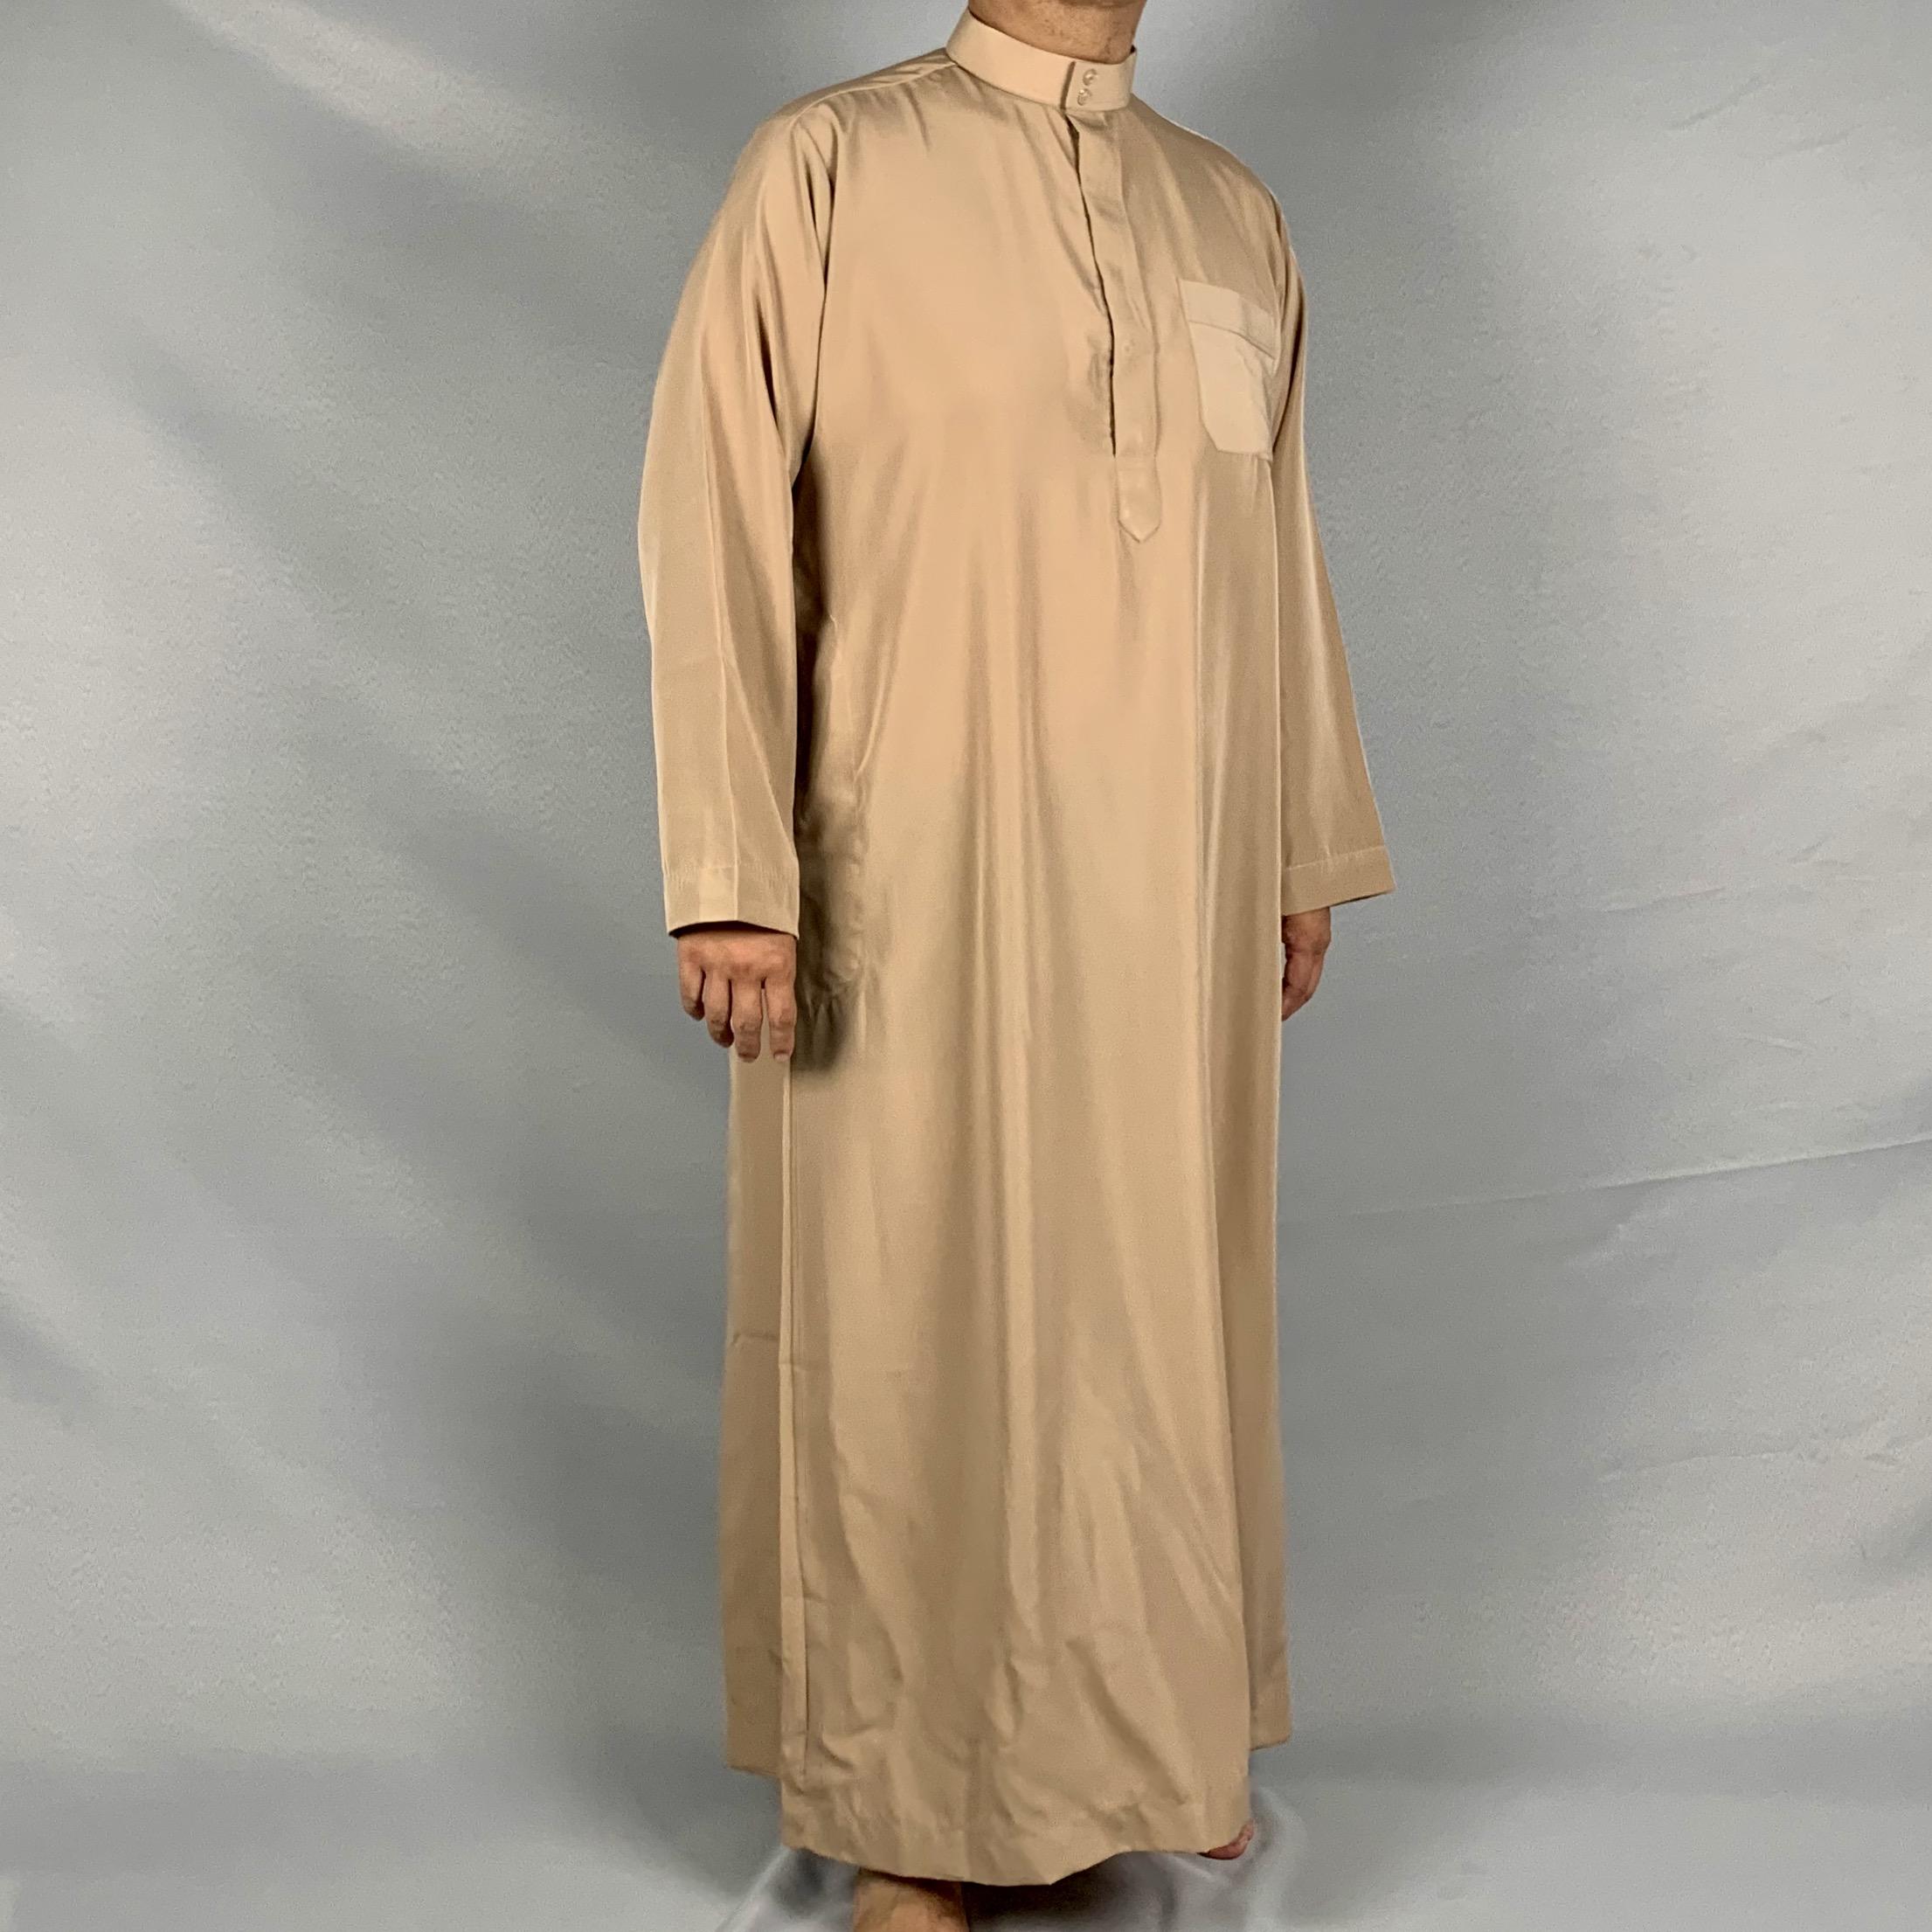 HIGH QUALITY ARABIC THOBE FOR MEN/ ISLAMIC CLOTHING